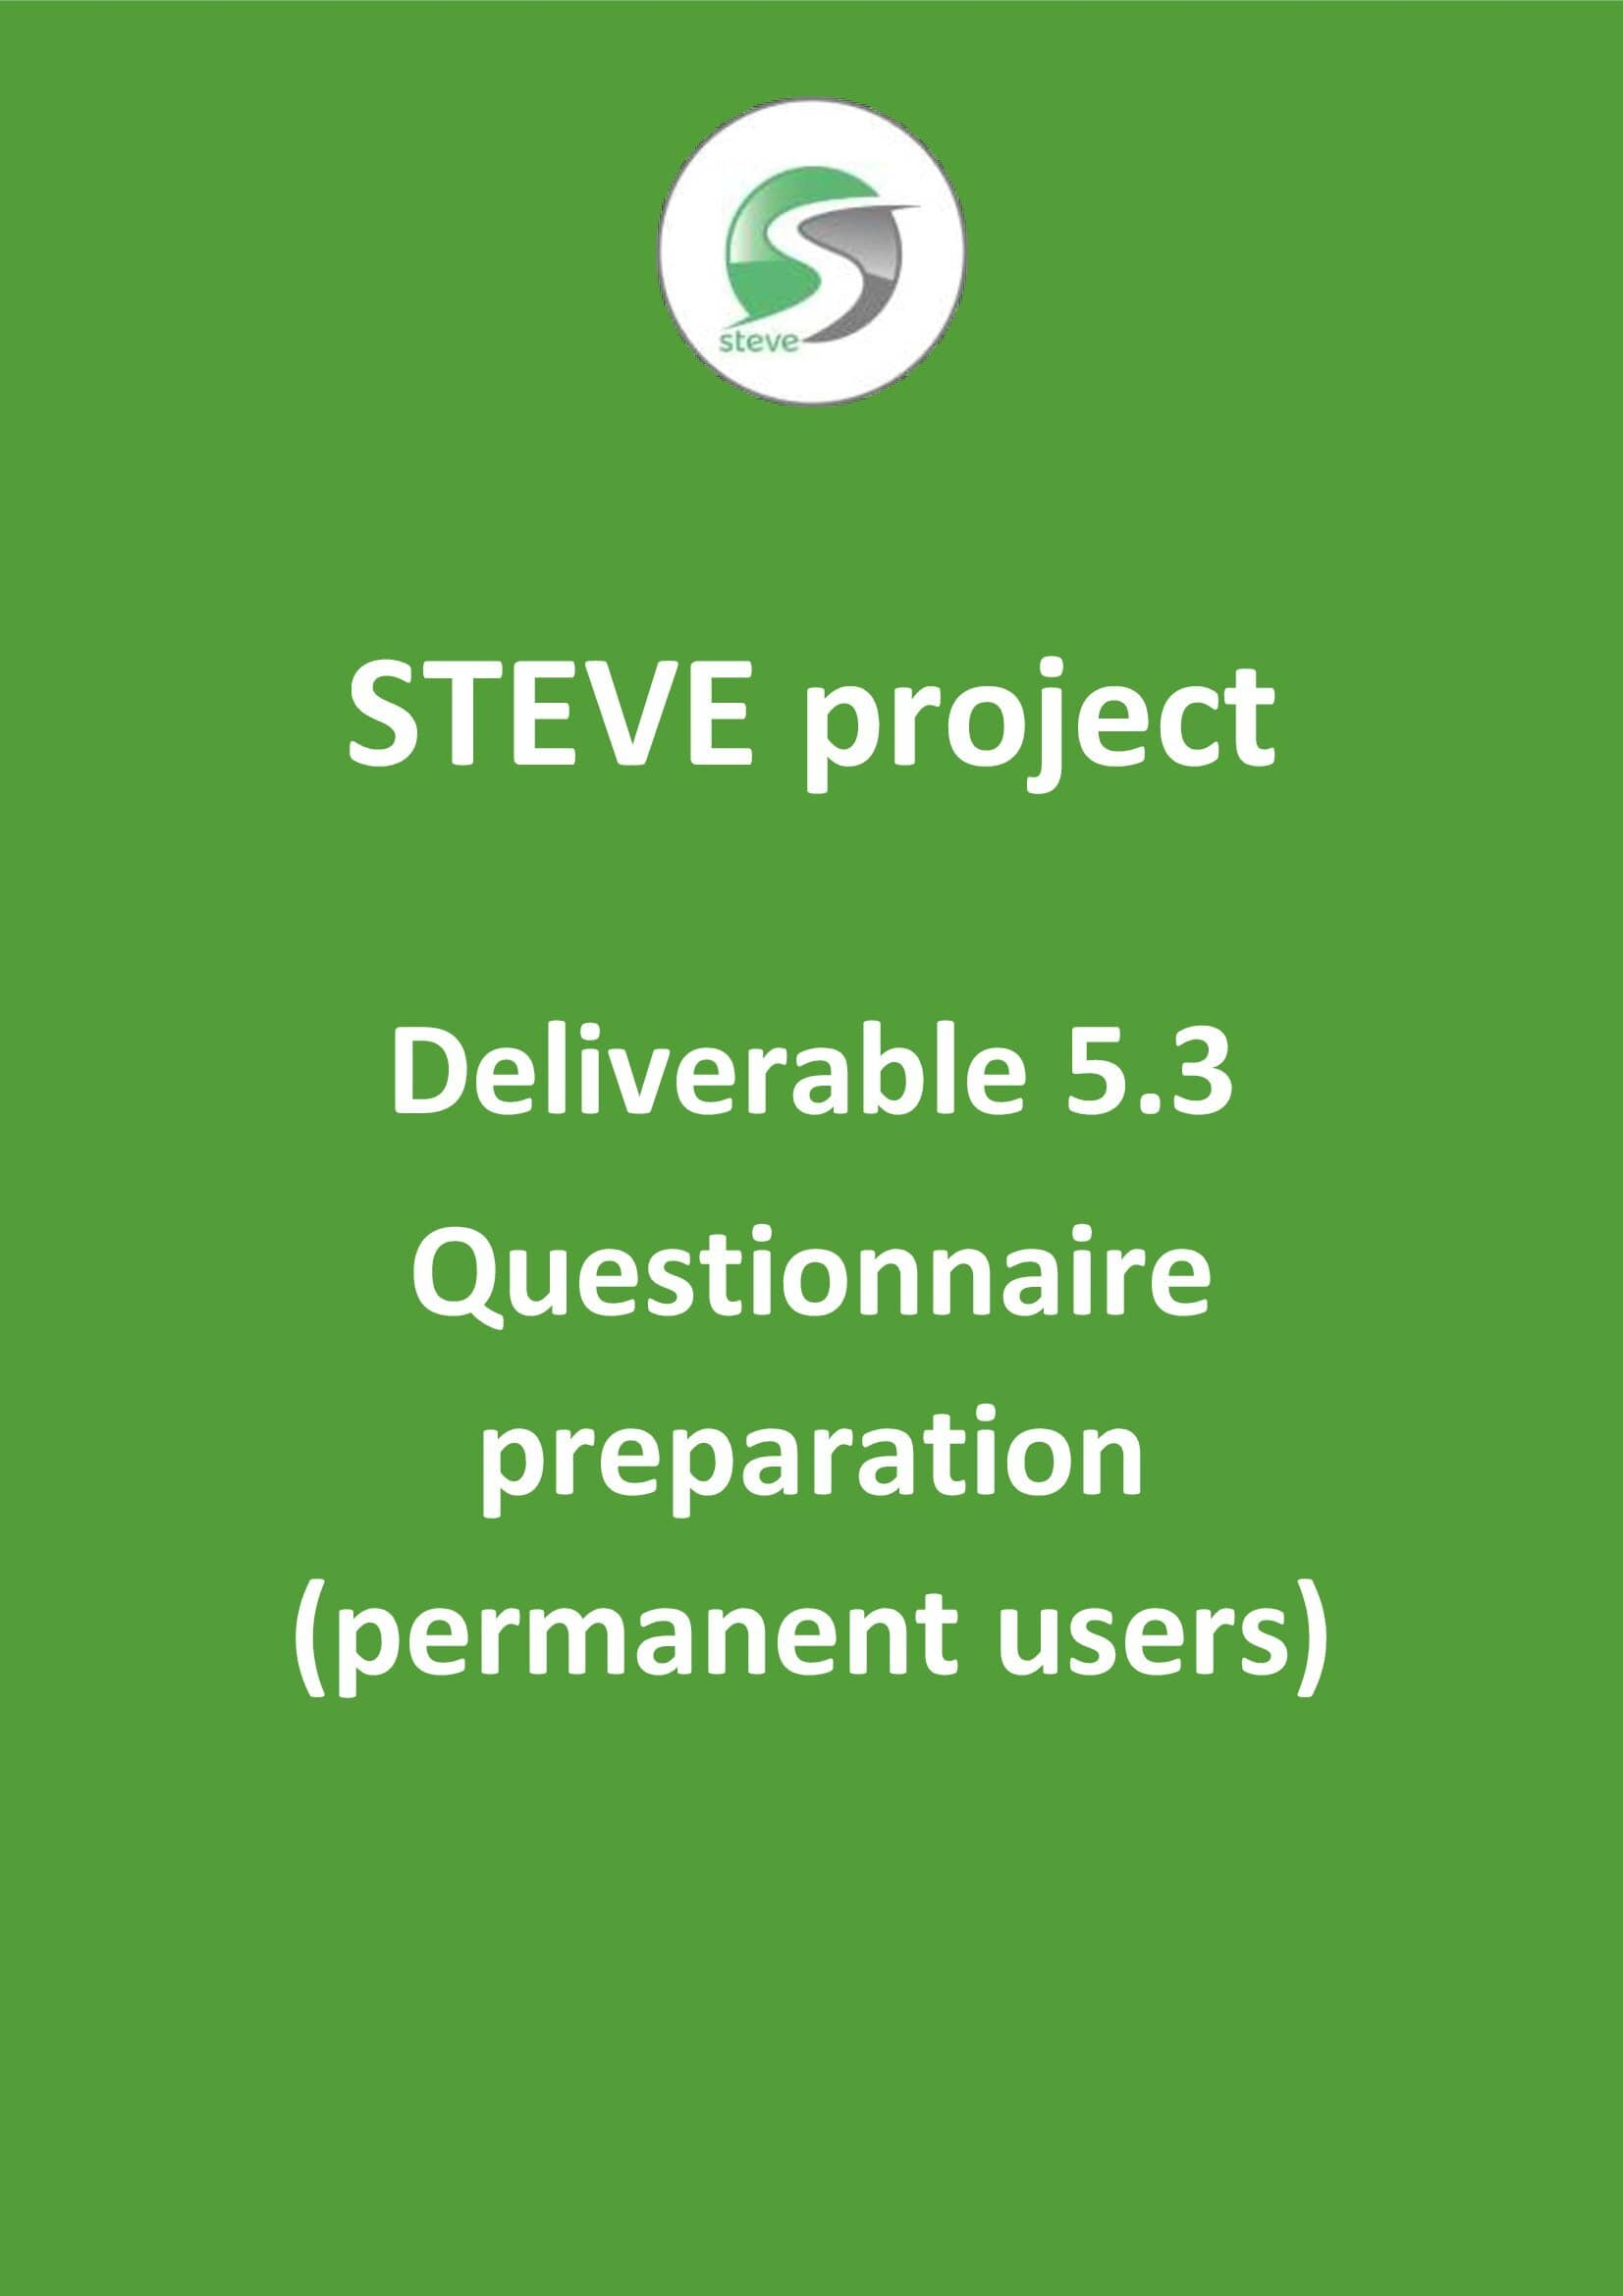 Deliverable 5.3